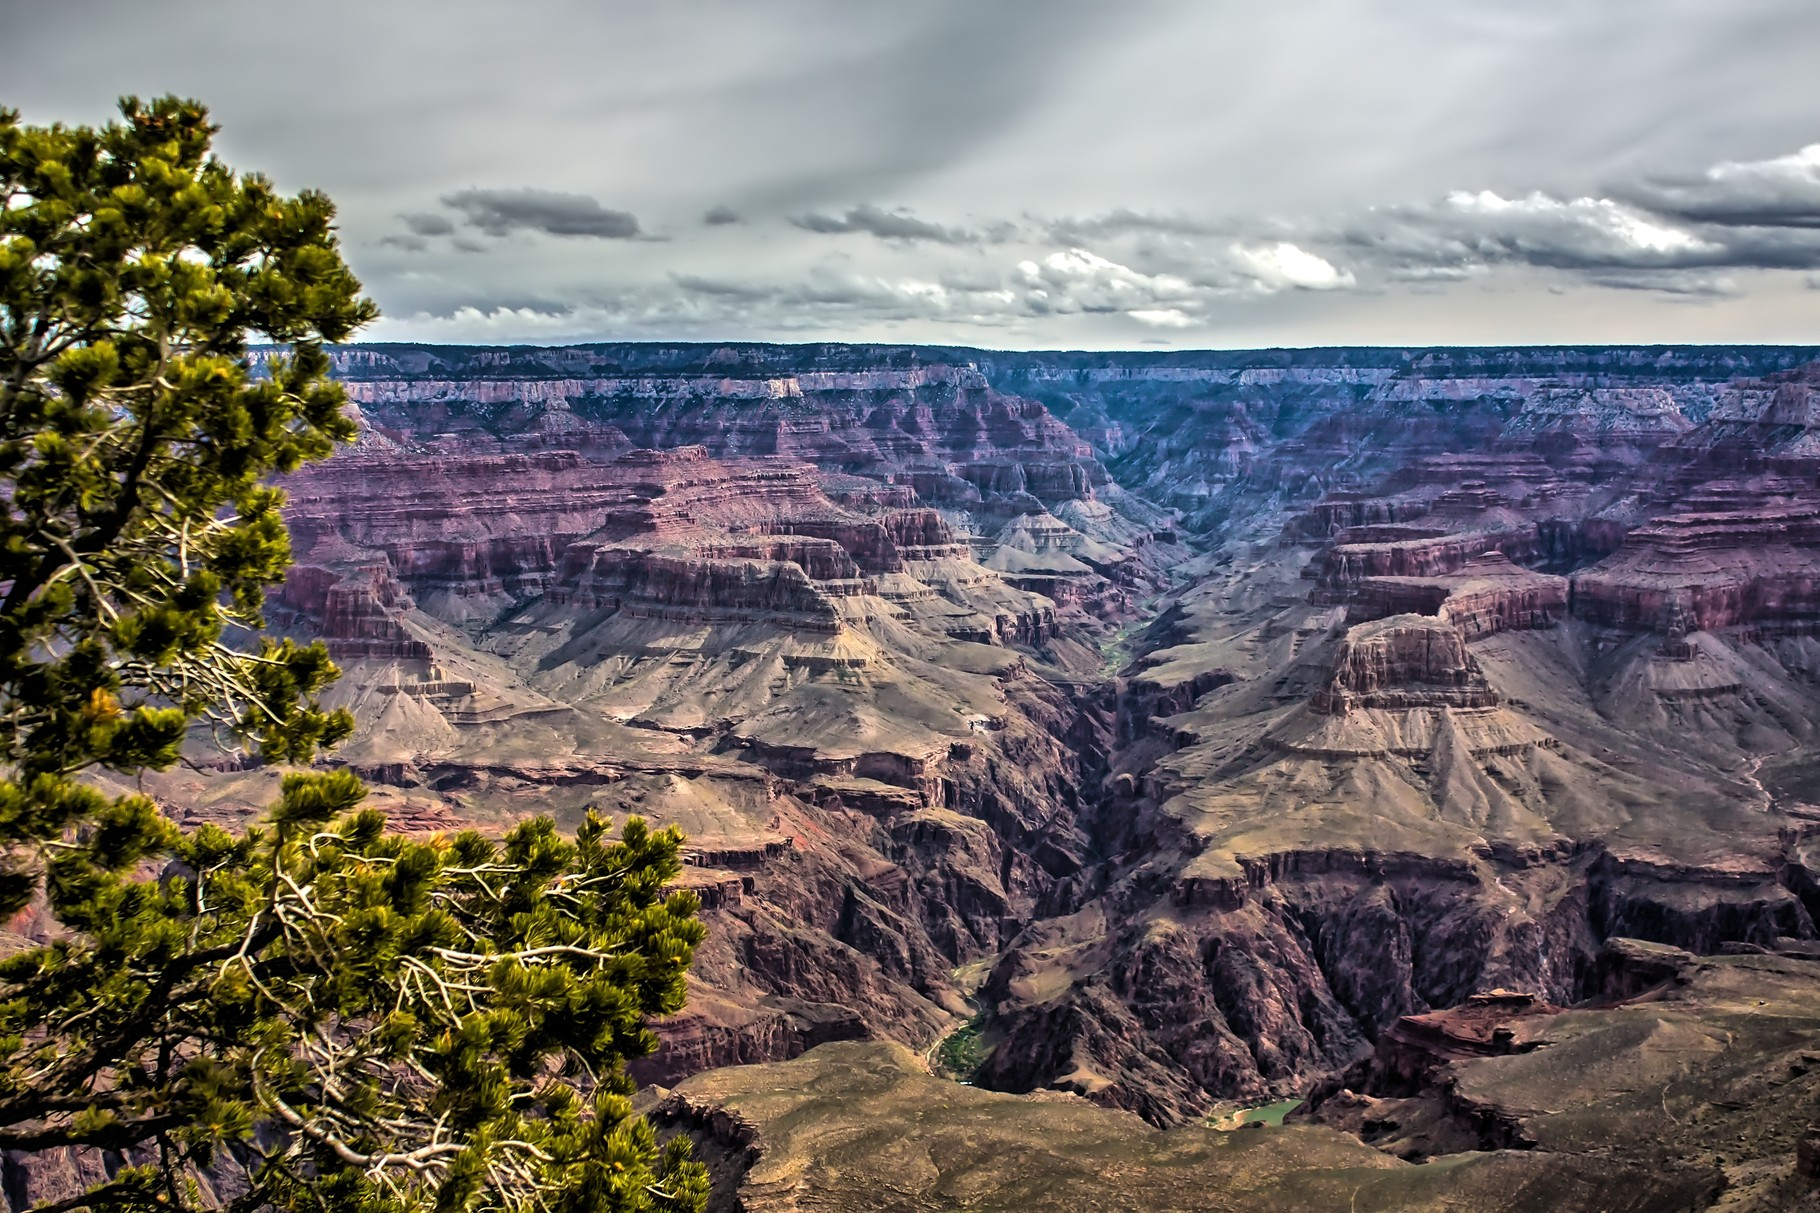 25_Grand Canyon (South Rim) in Arizona